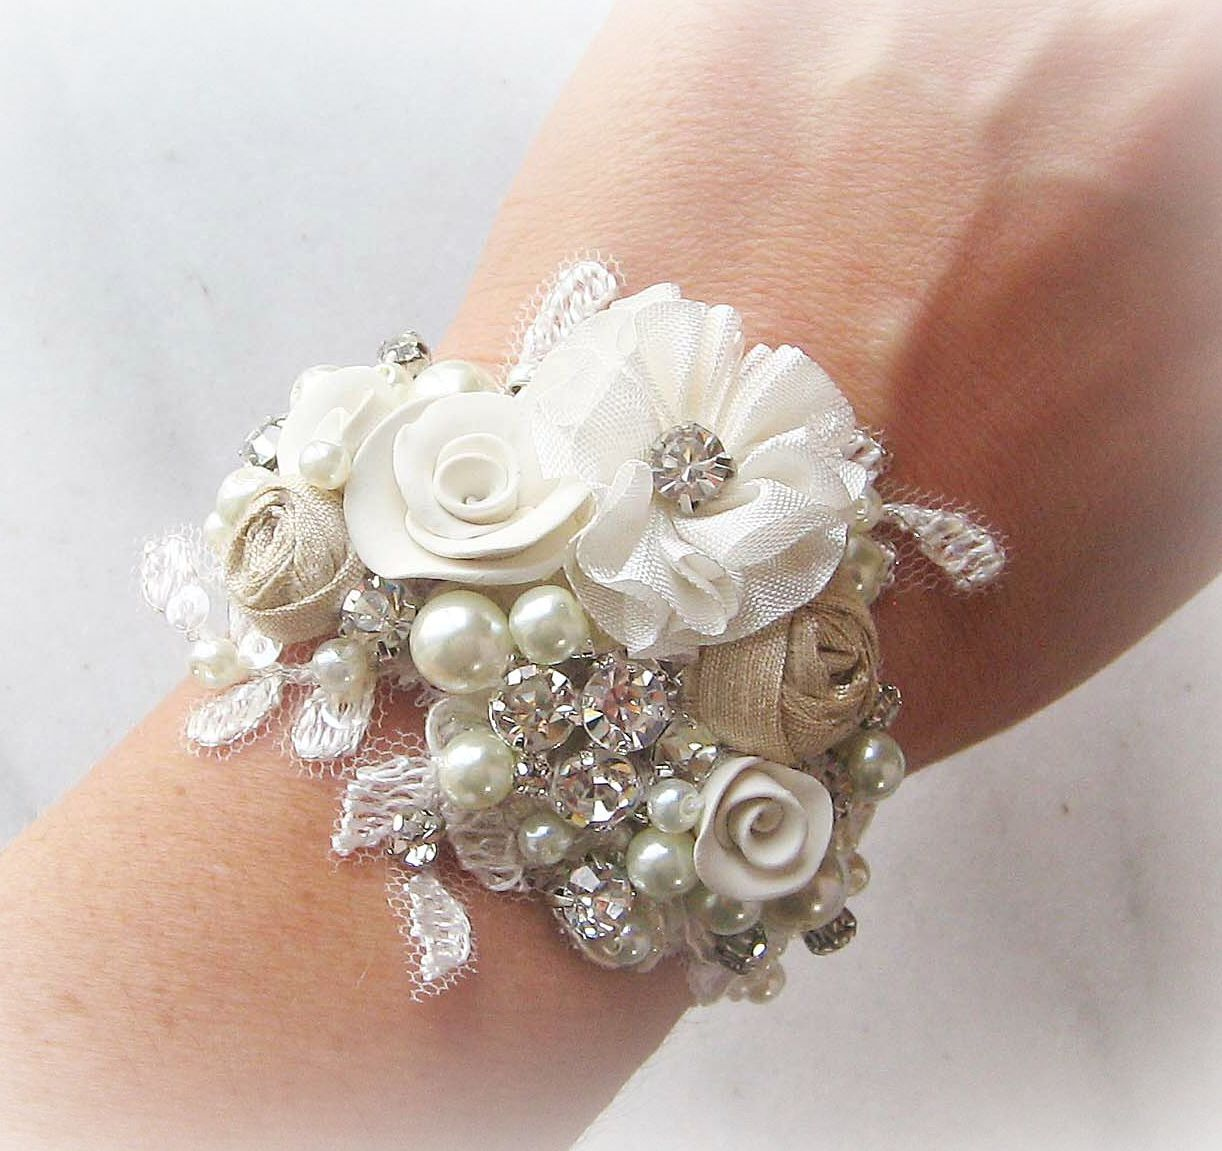 Vintage Style Bridal Cuff Bracelet Wrist Corsage Custom Rustic Wedding Rhinestone Pearl Promise By Theredmagnolia On